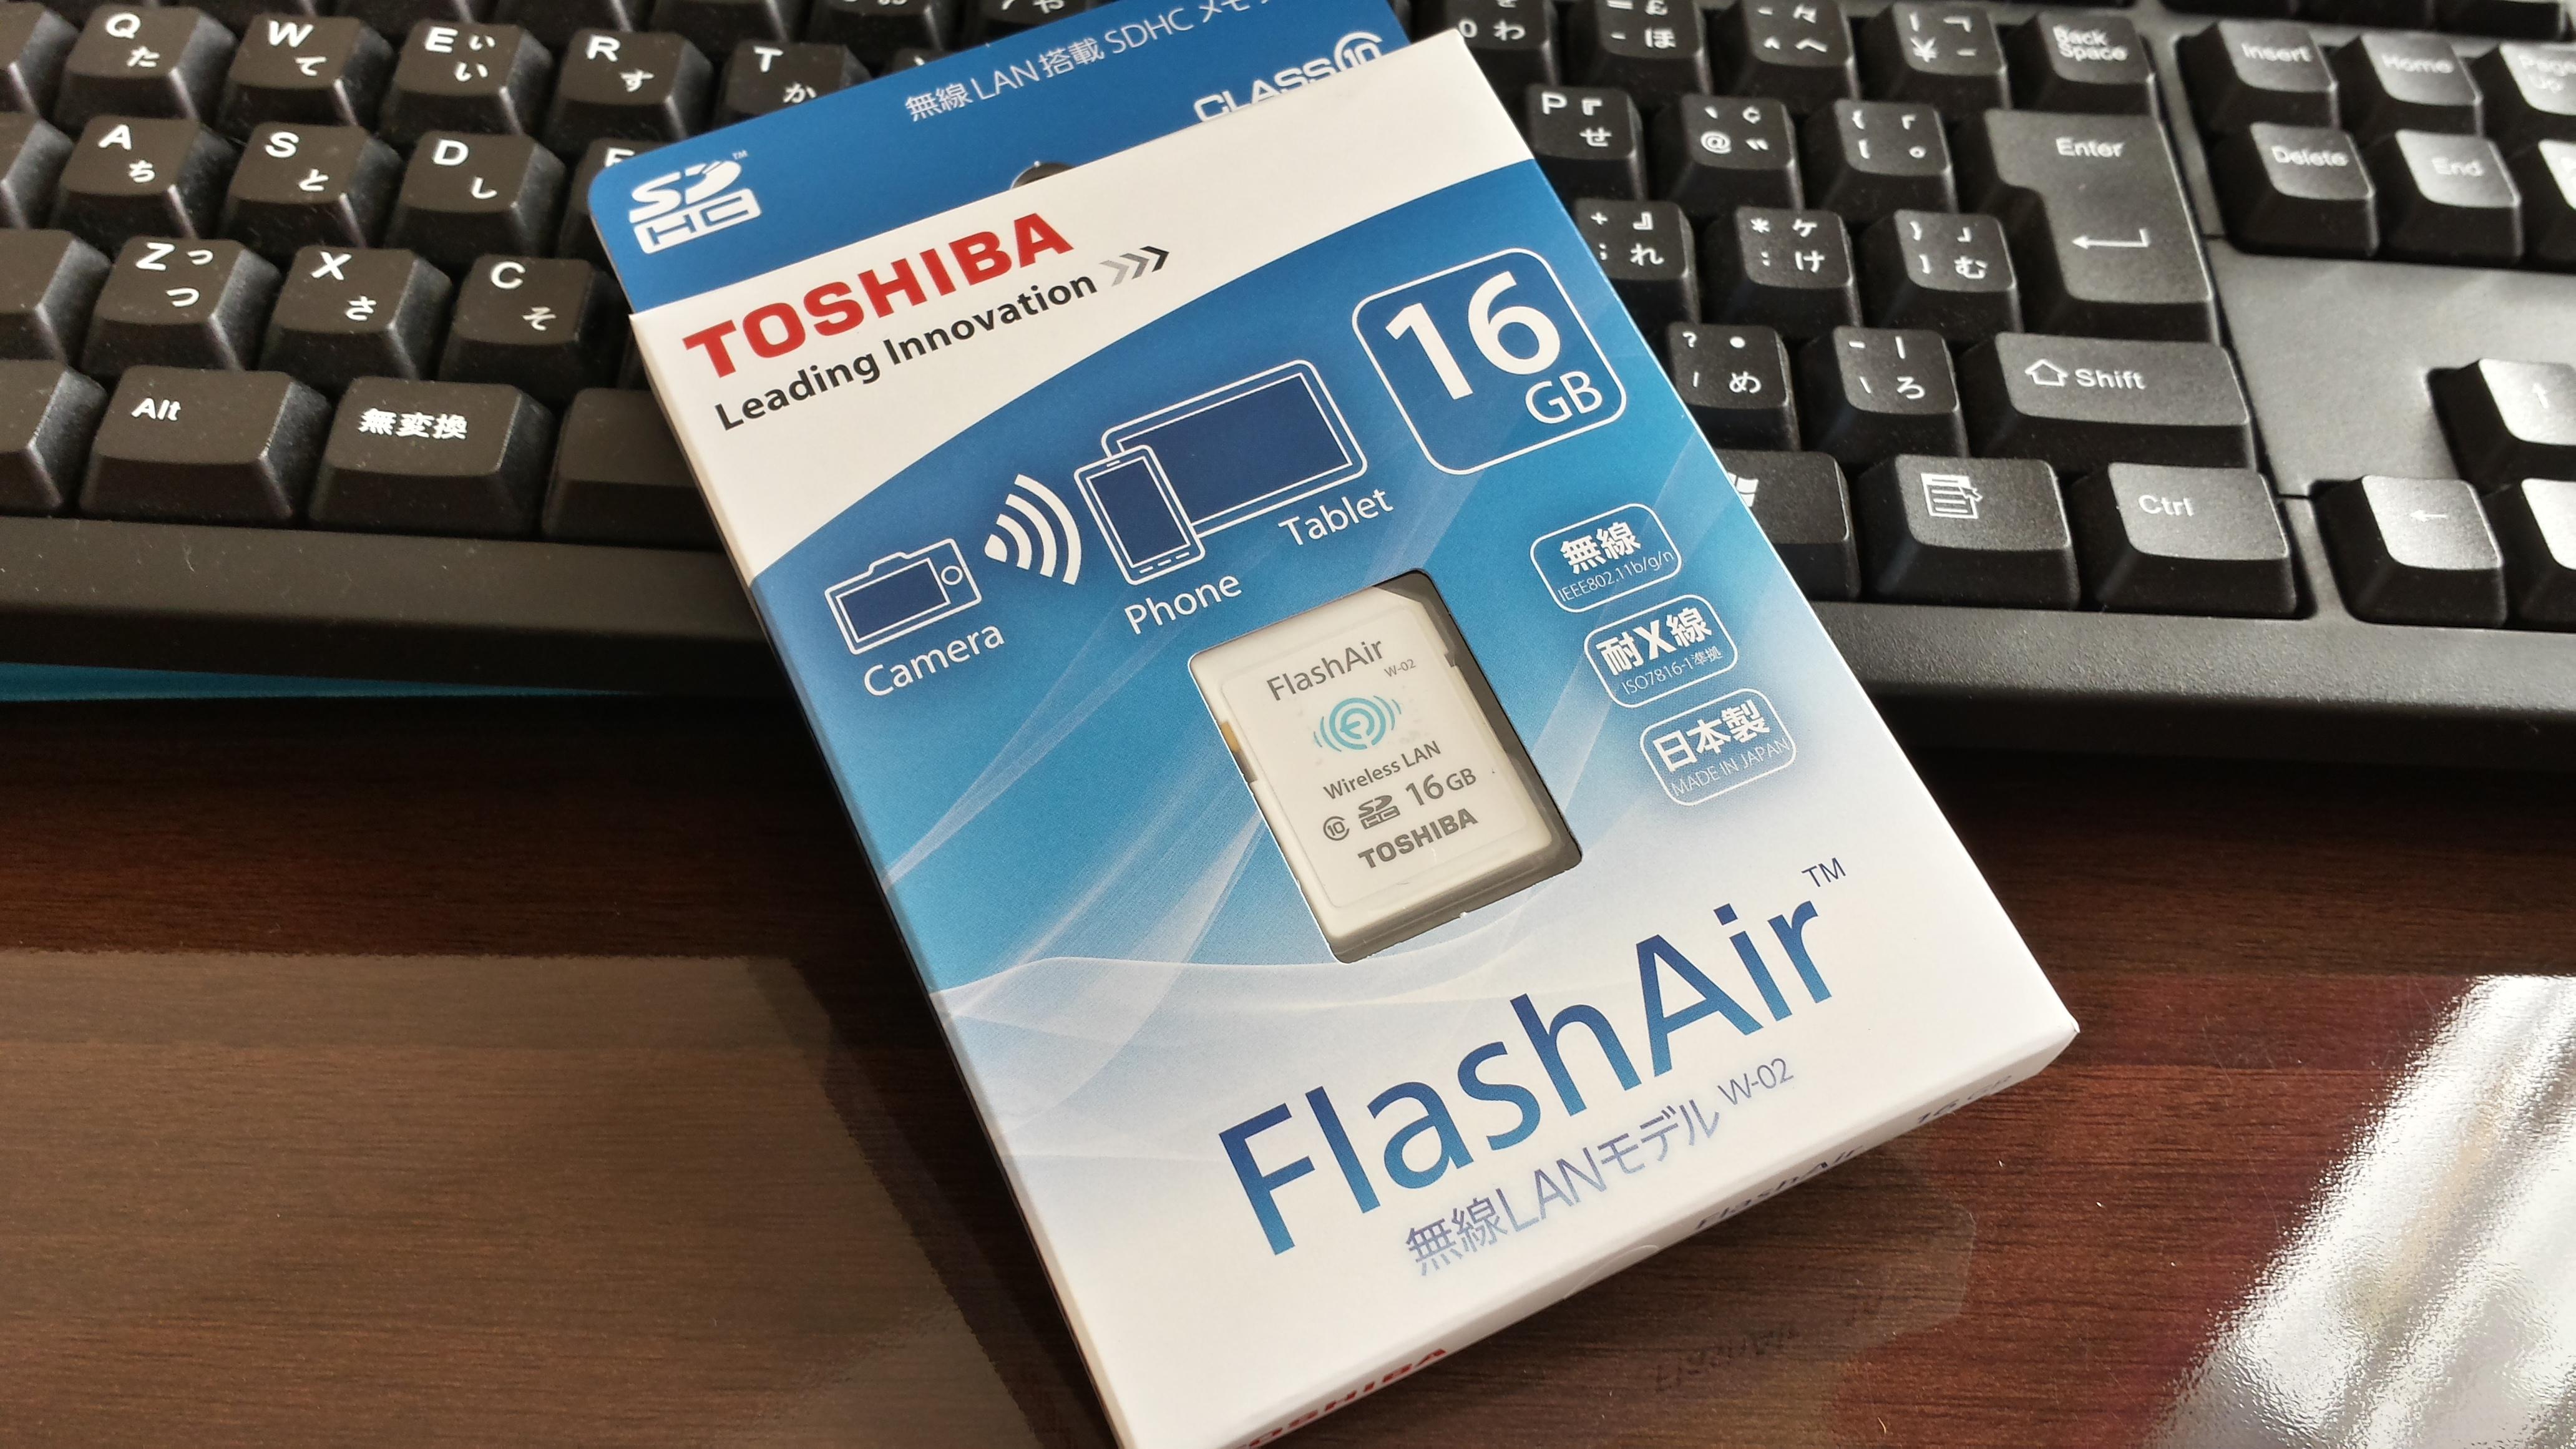 FlashAir